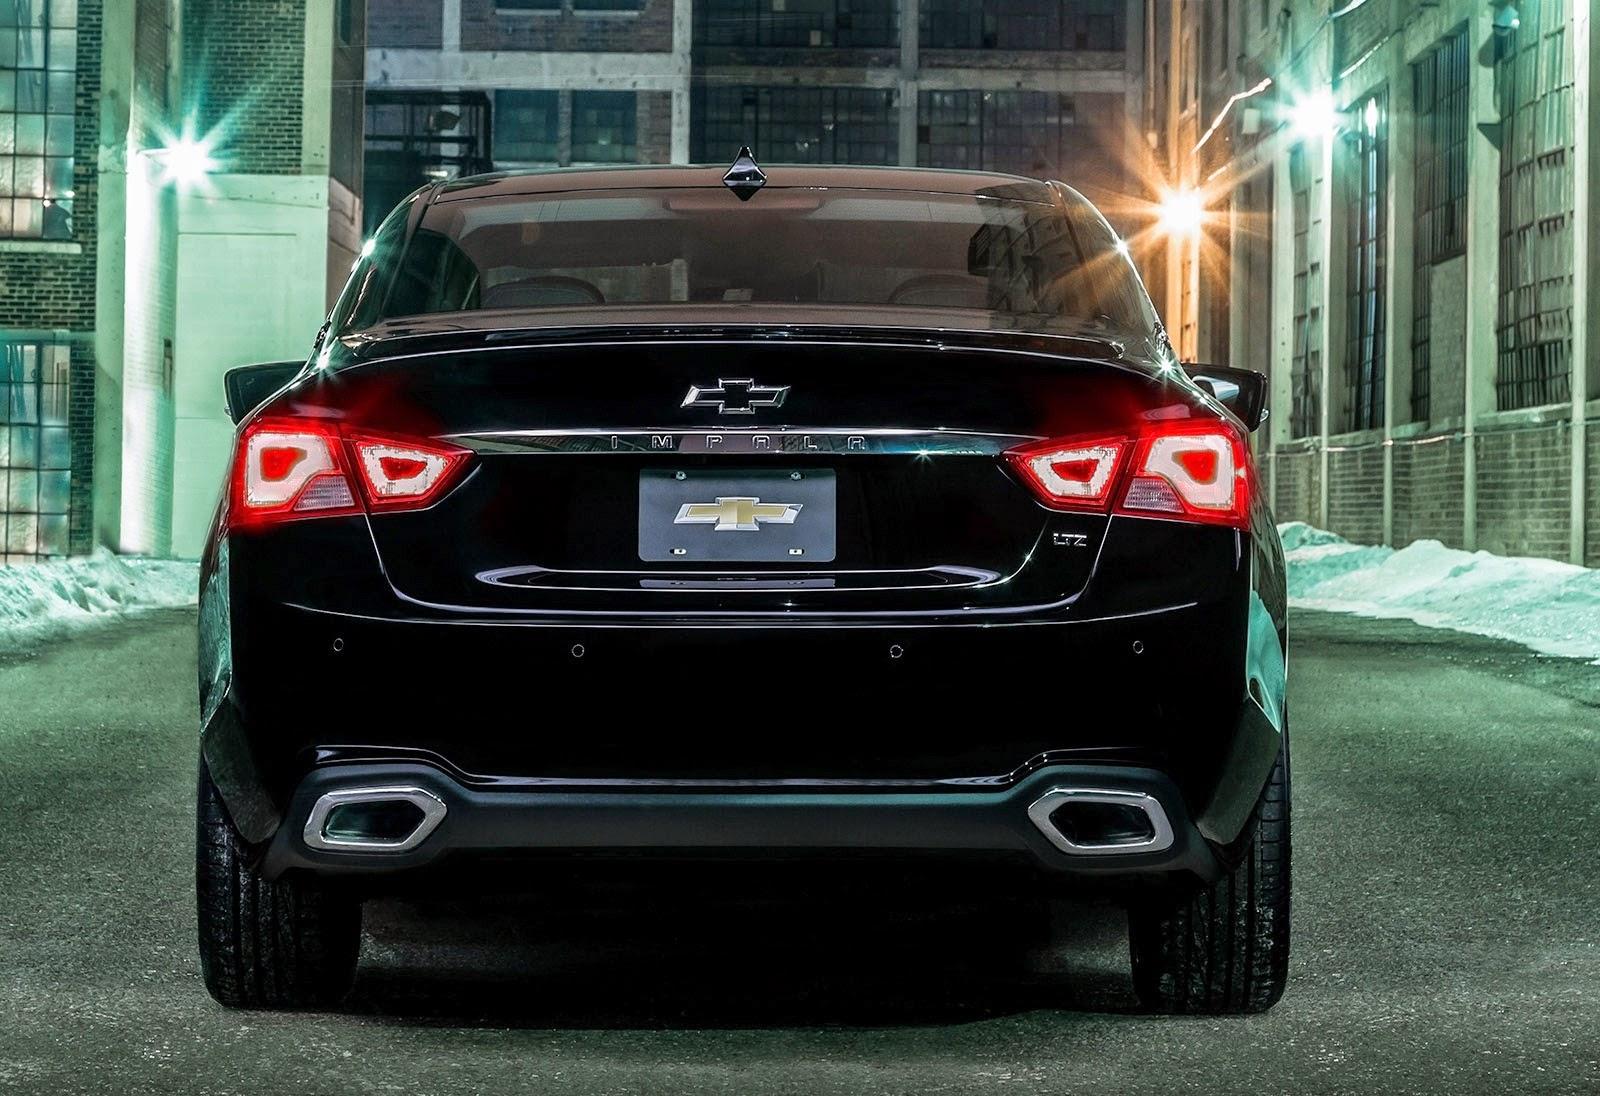 2016 chevrolet impala midnight edition the impala midnight edition ...